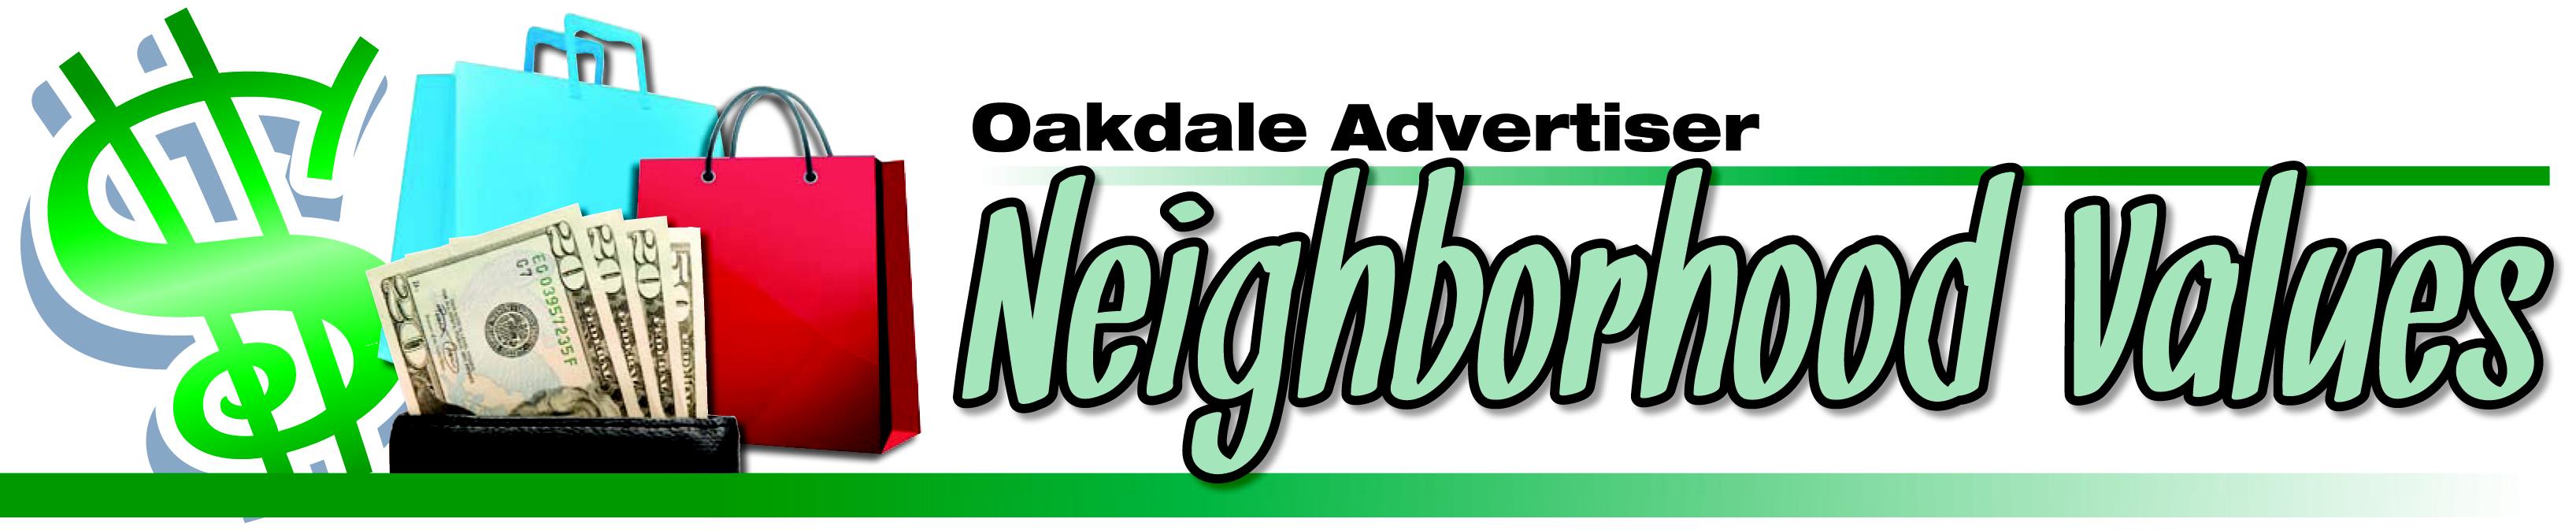 Oakdale Advertiser